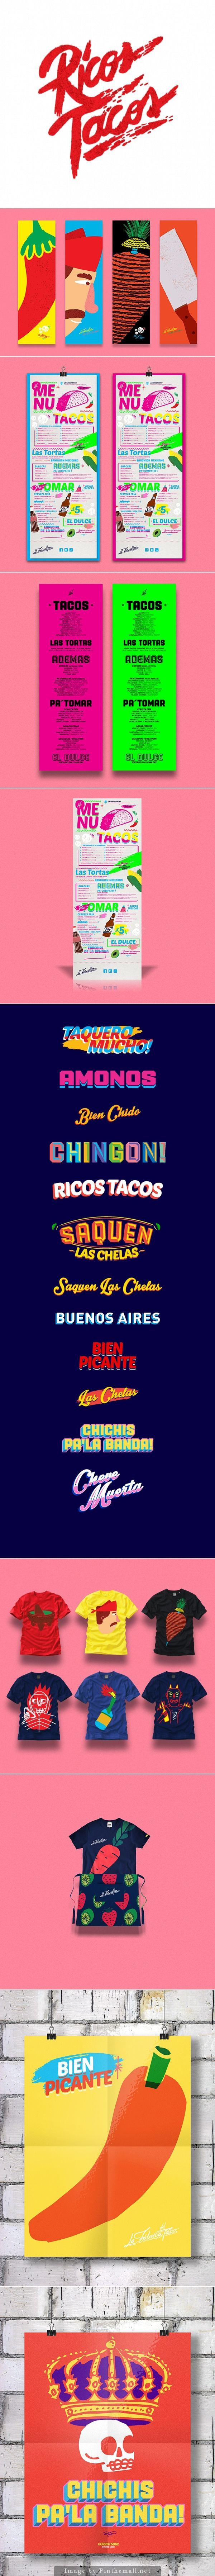 La Fábrica del Taco identity by Bosque